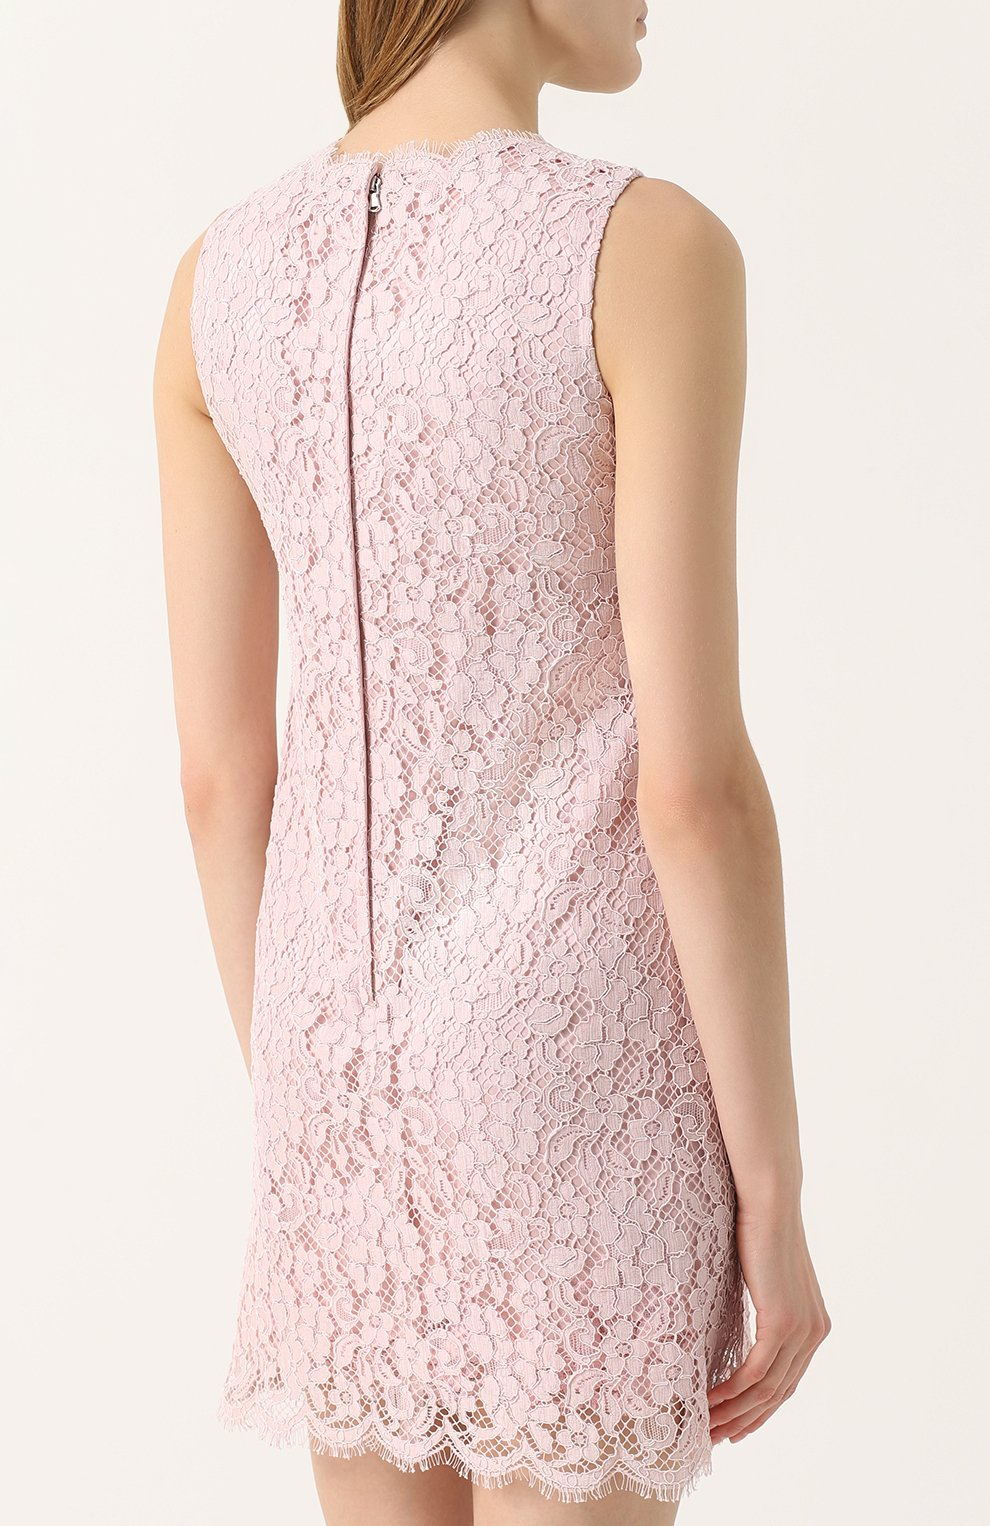 Кружевное мини-платье без рукавов Dolce & Gabbana розовое | Фото №3